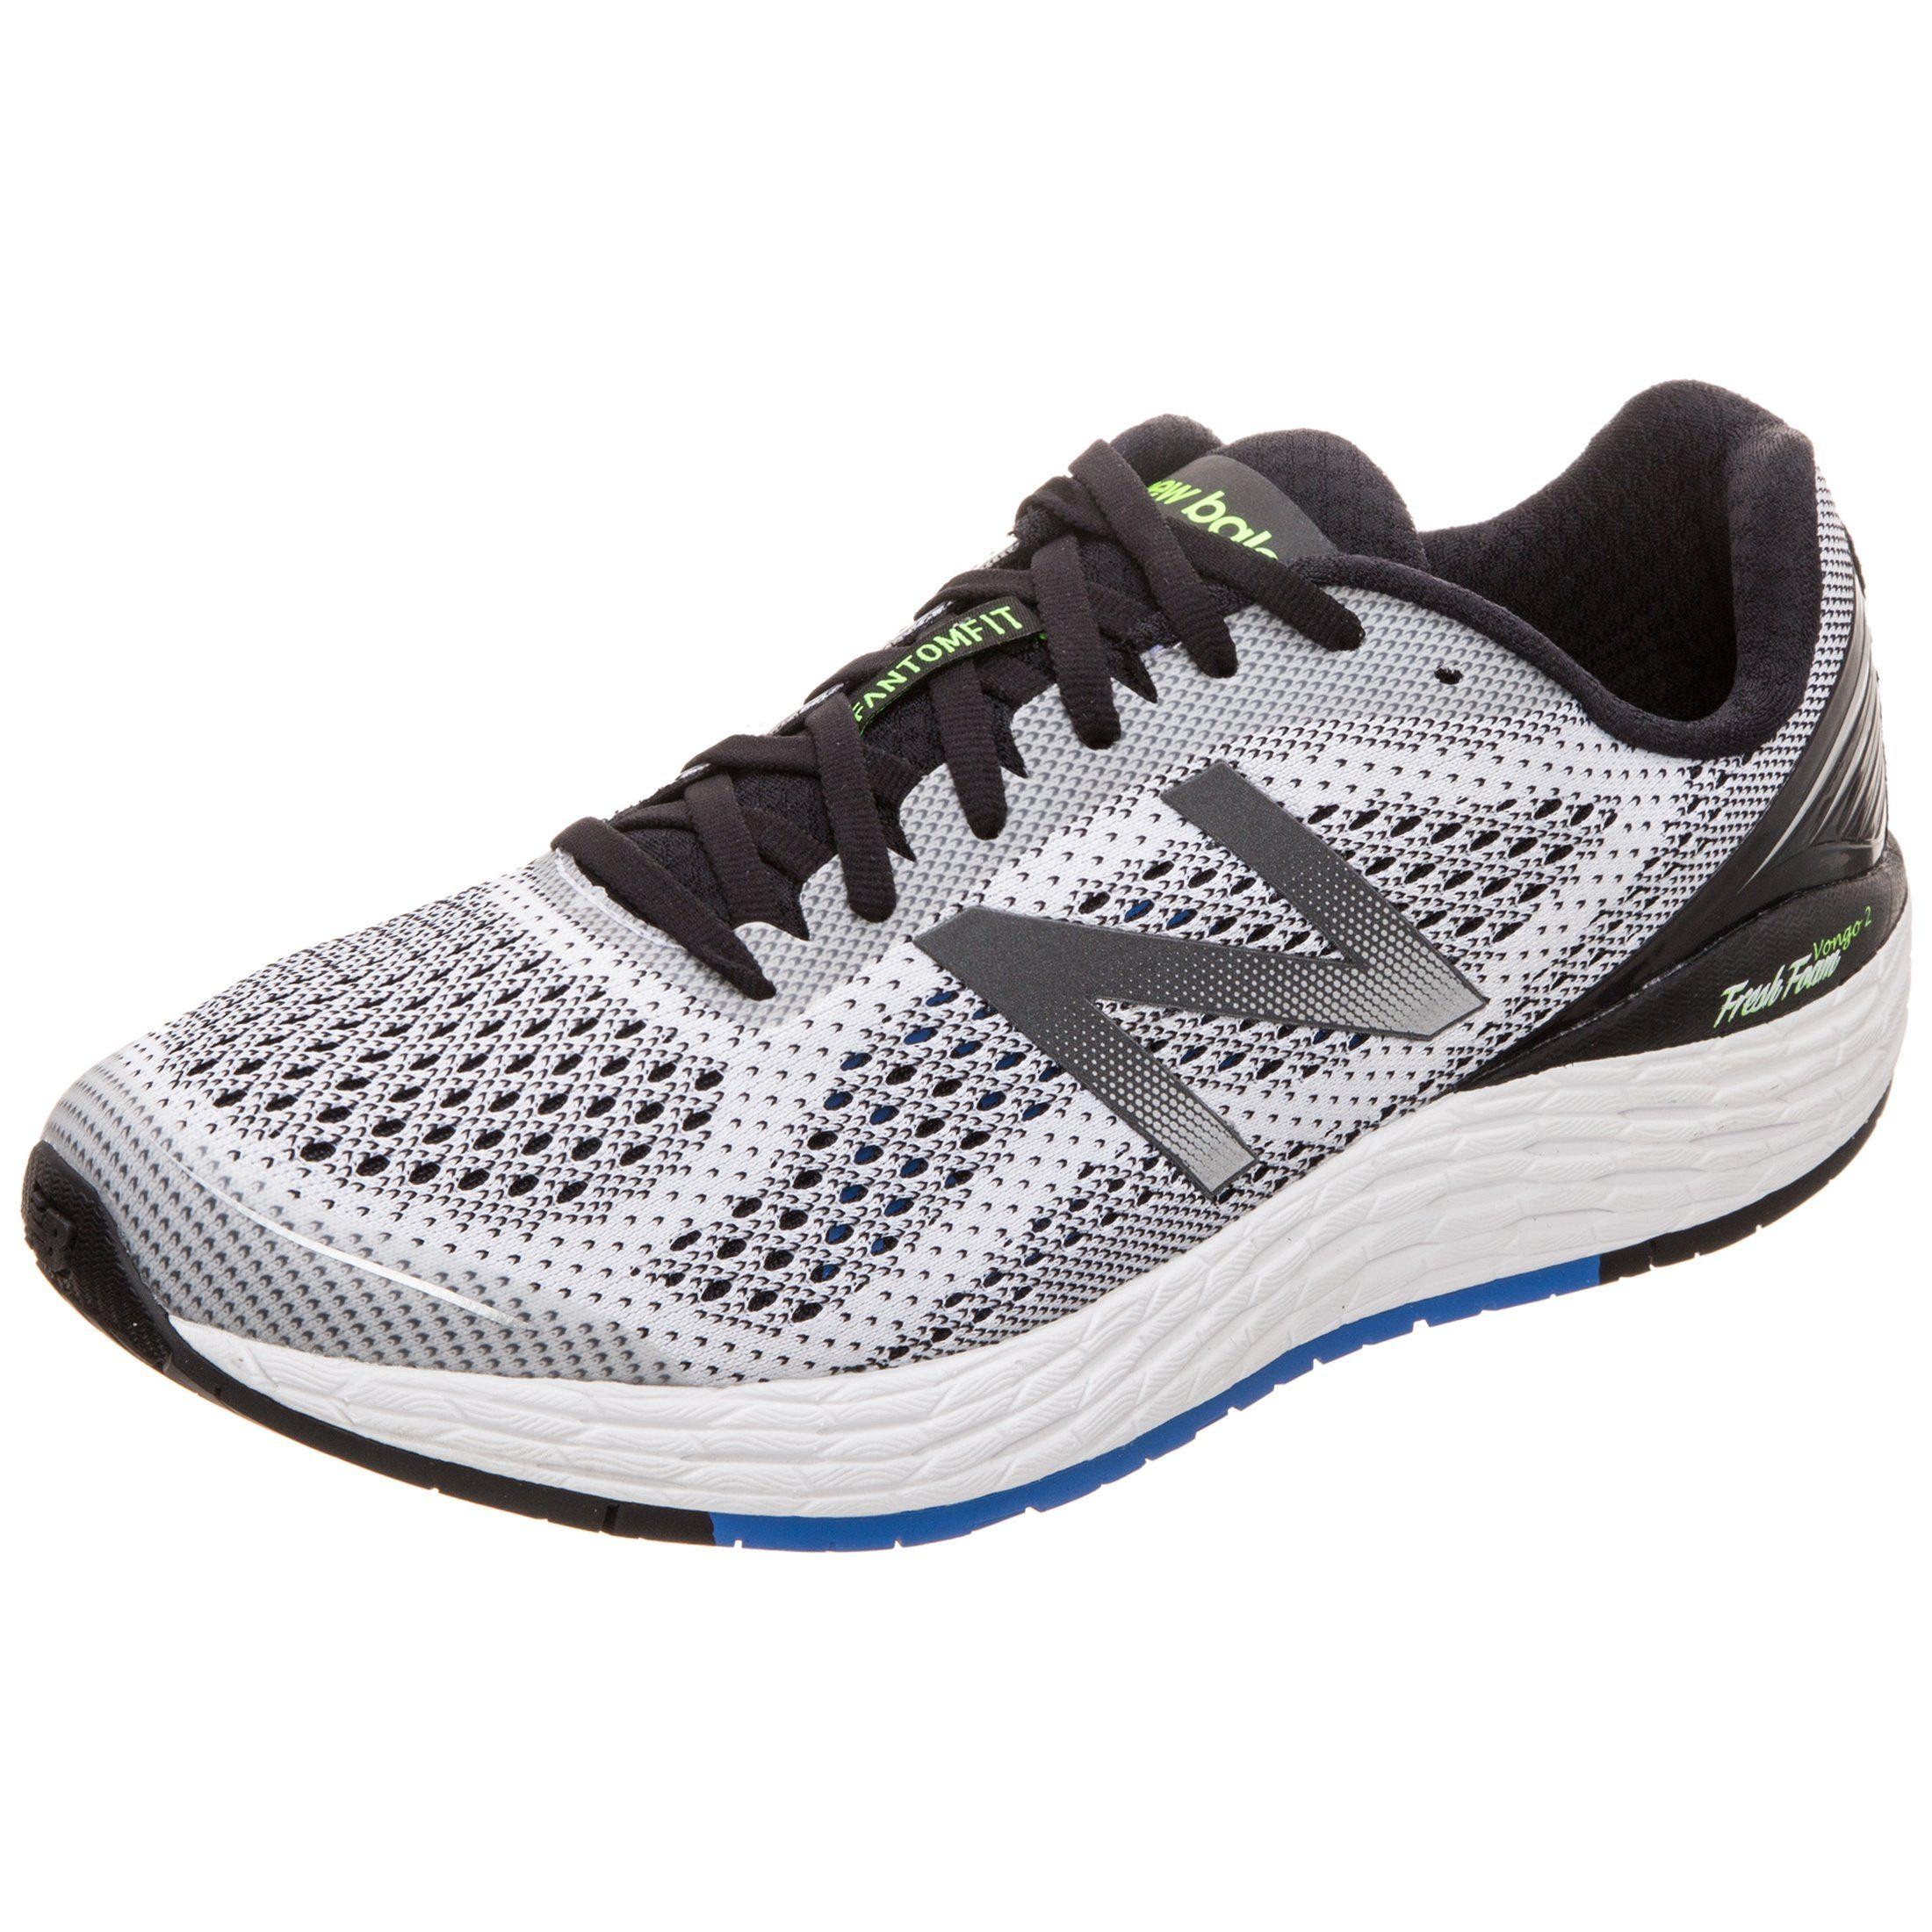 New Balance Laufschuh Fresh Foam Vongo V2 | Schuhe > Sportschuhe > Laufschuhe | Grau | New Balance